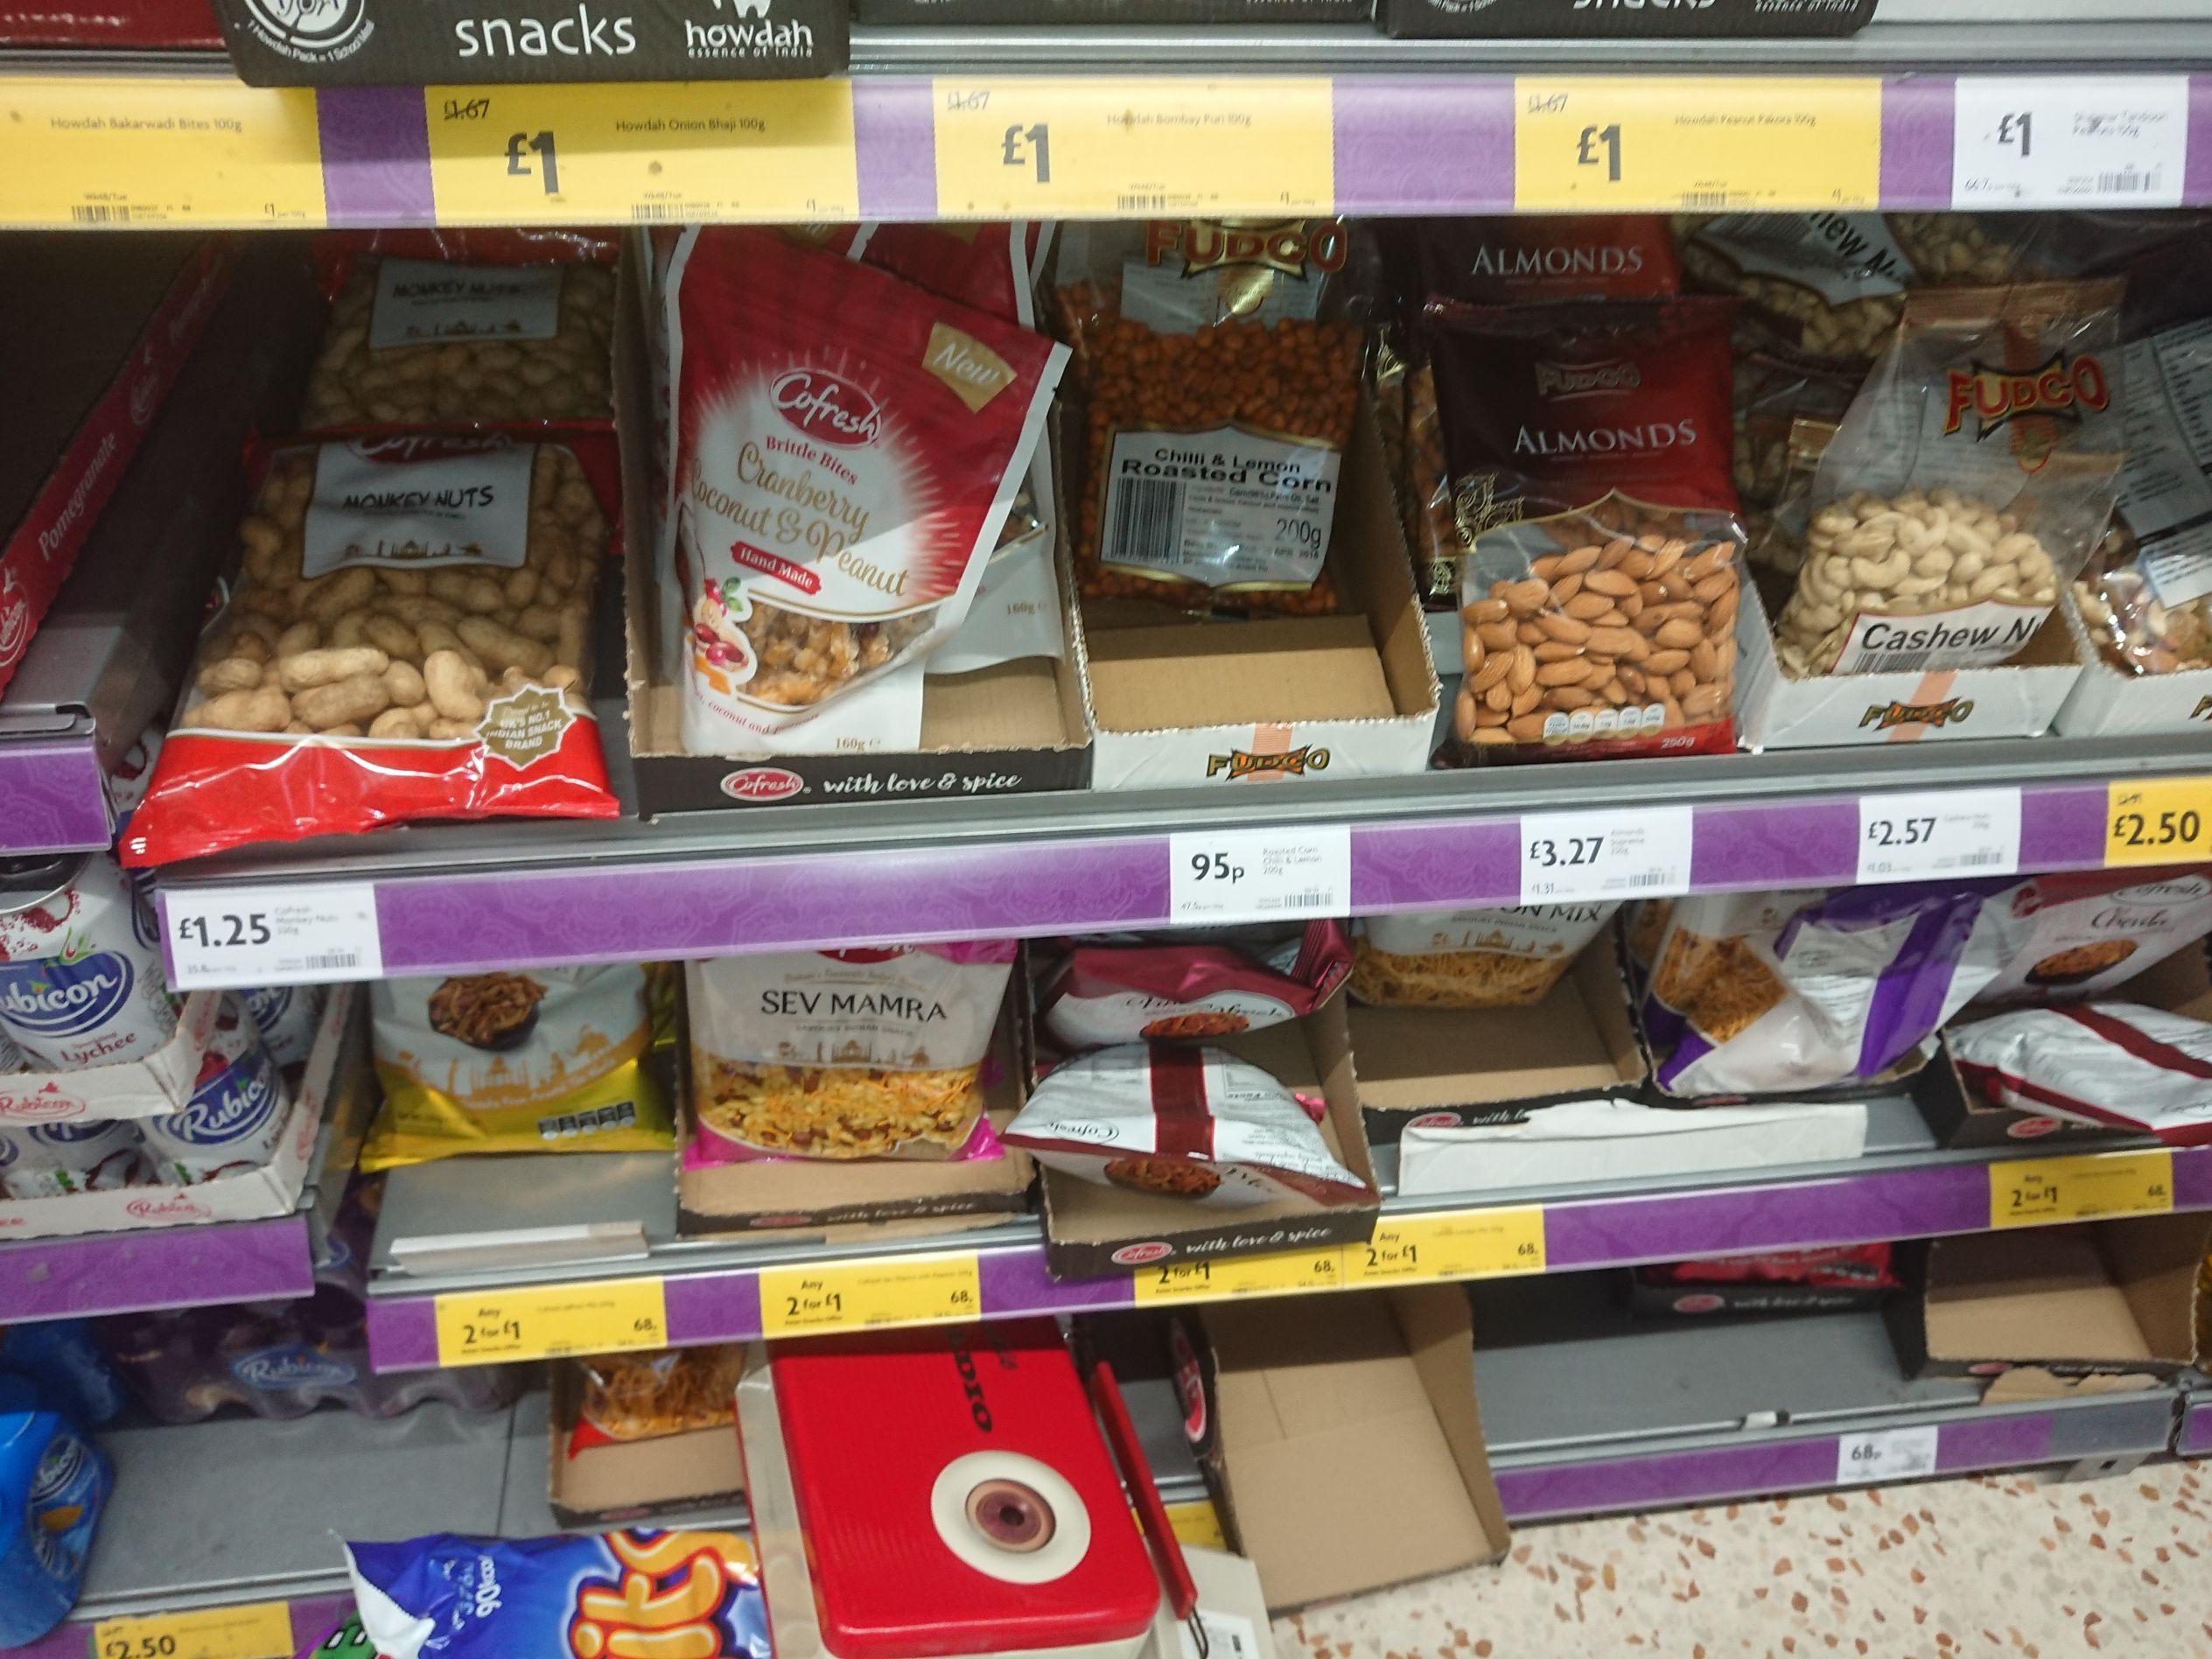 Cofresh Asian Snack Mix Various Flavours Balti Vindaloo London etc  £1 for 2 packs 200g each Morrisons